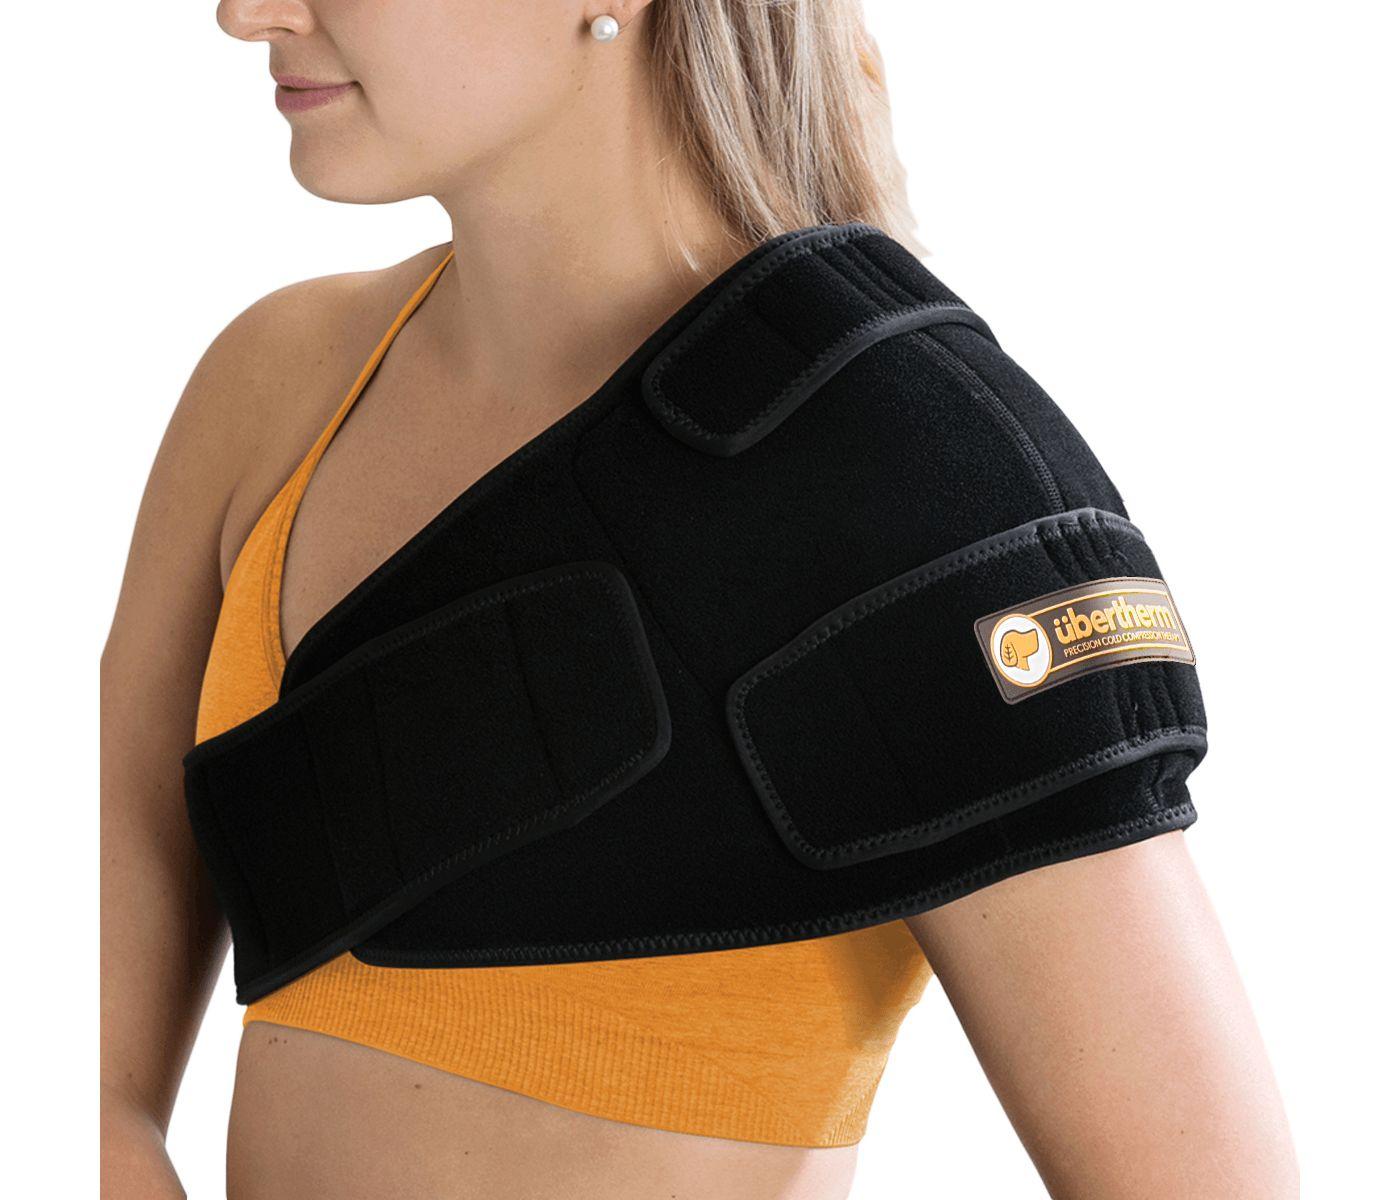 Ubertherm Shoulder Cold Wrap